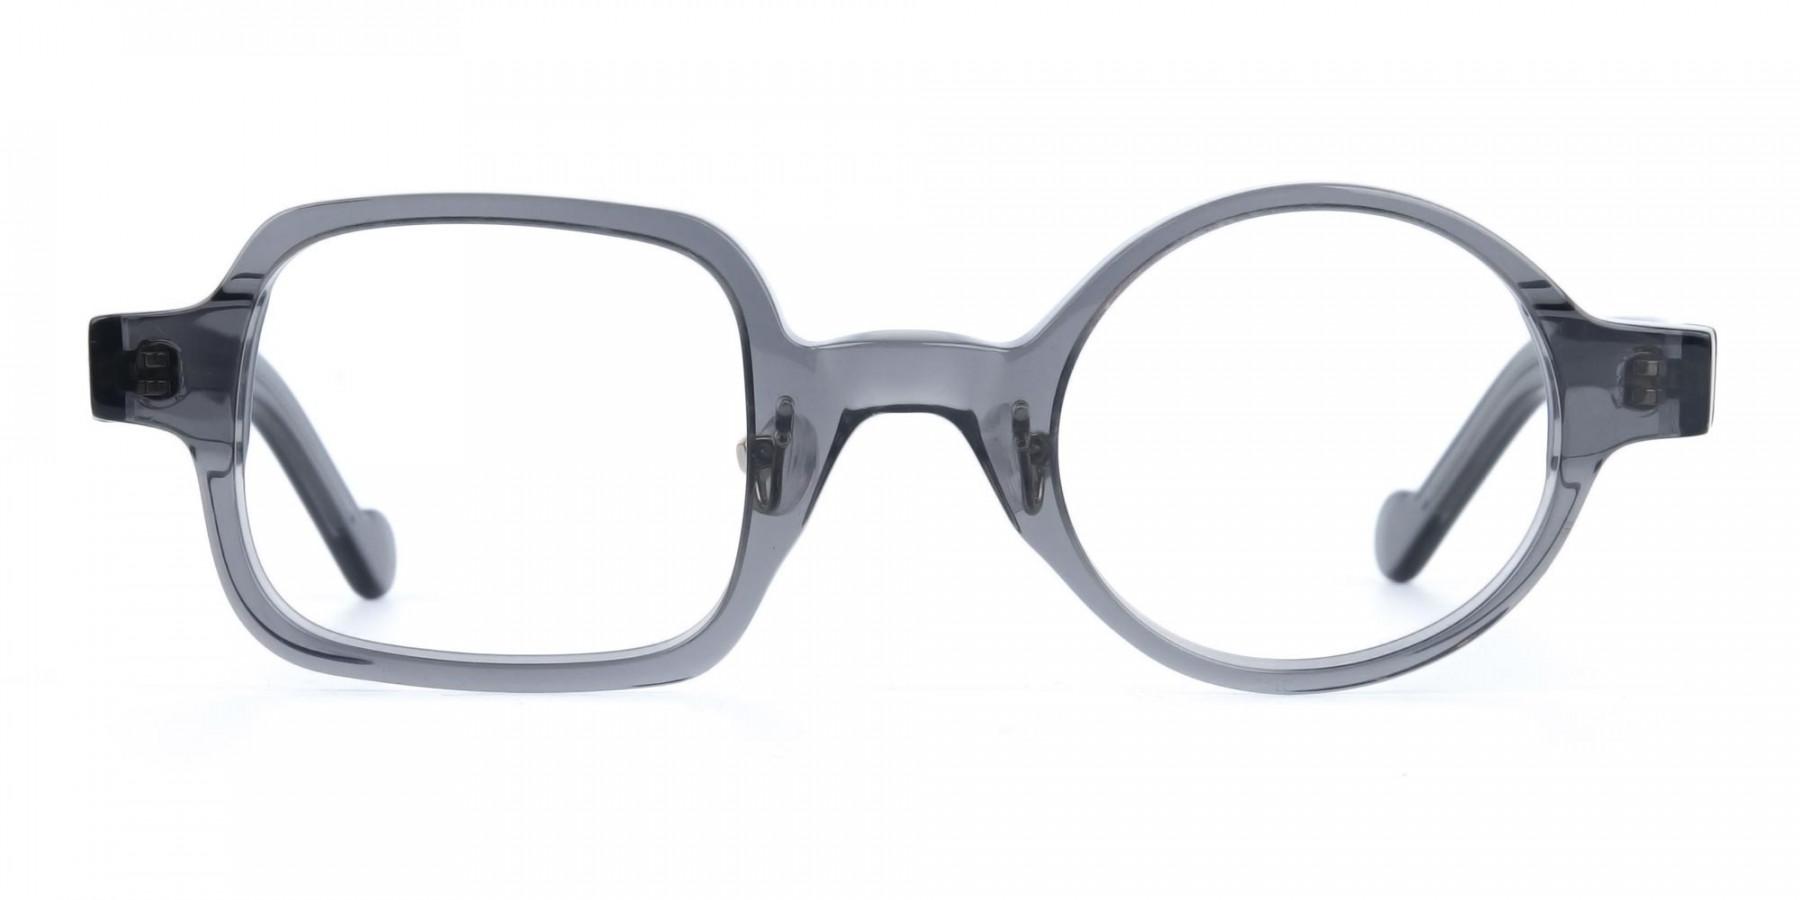 Asymmetric Round and Square Eyeglasses-1